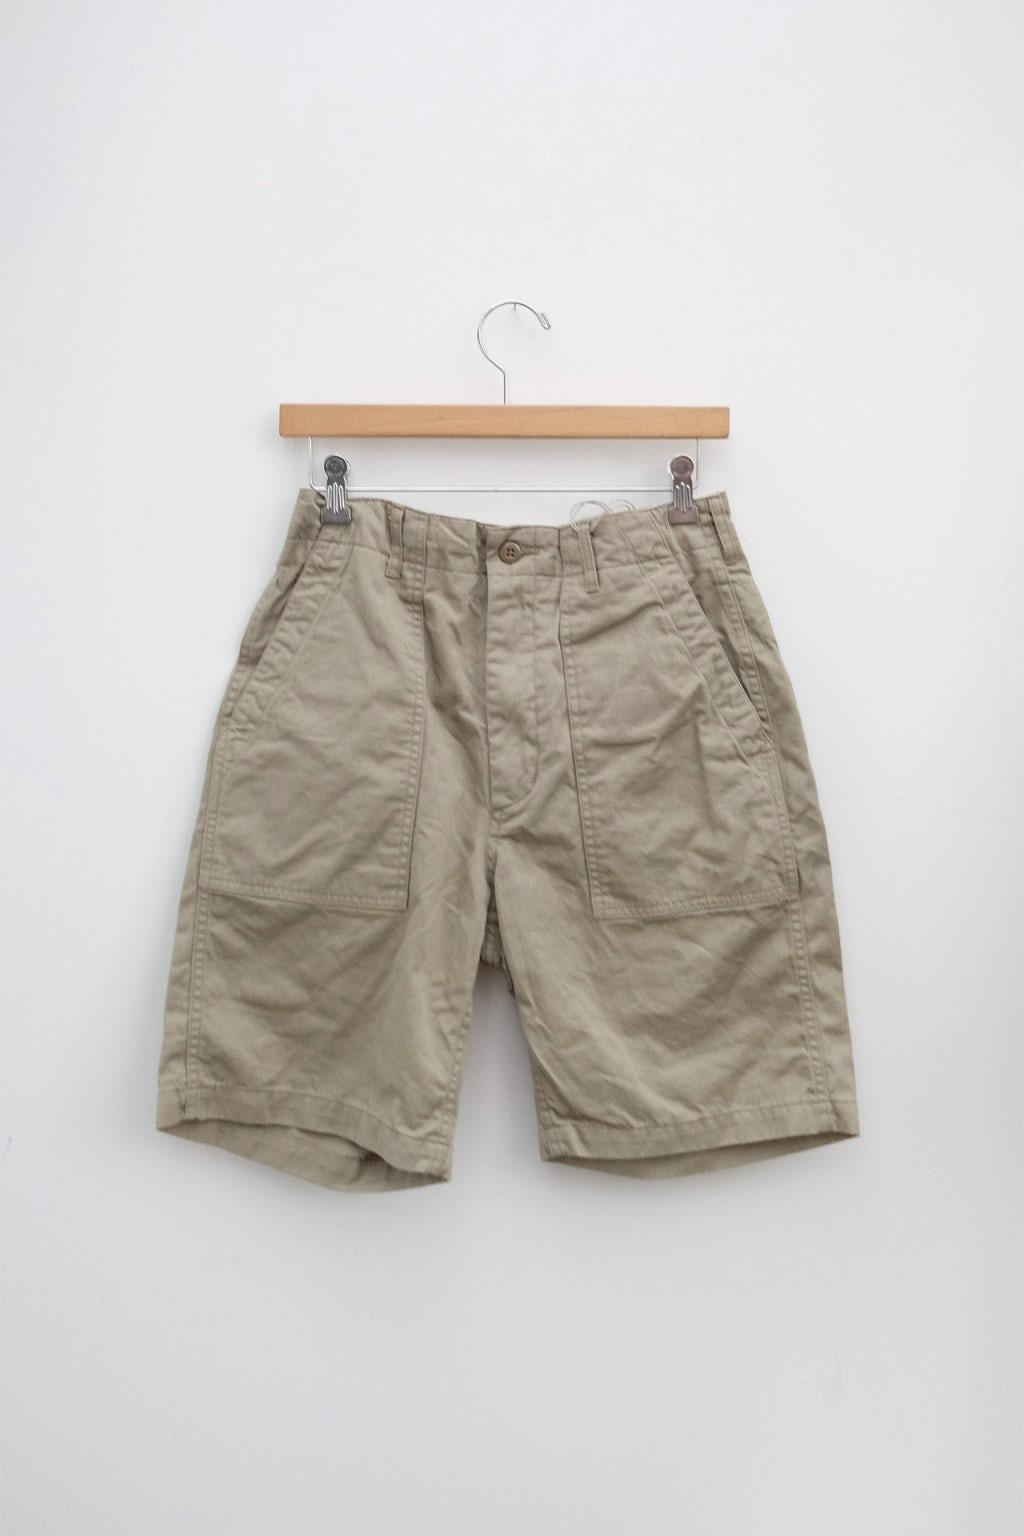 Engineered Garments Fatigue Short Khaki 6.5oz Flat Twill